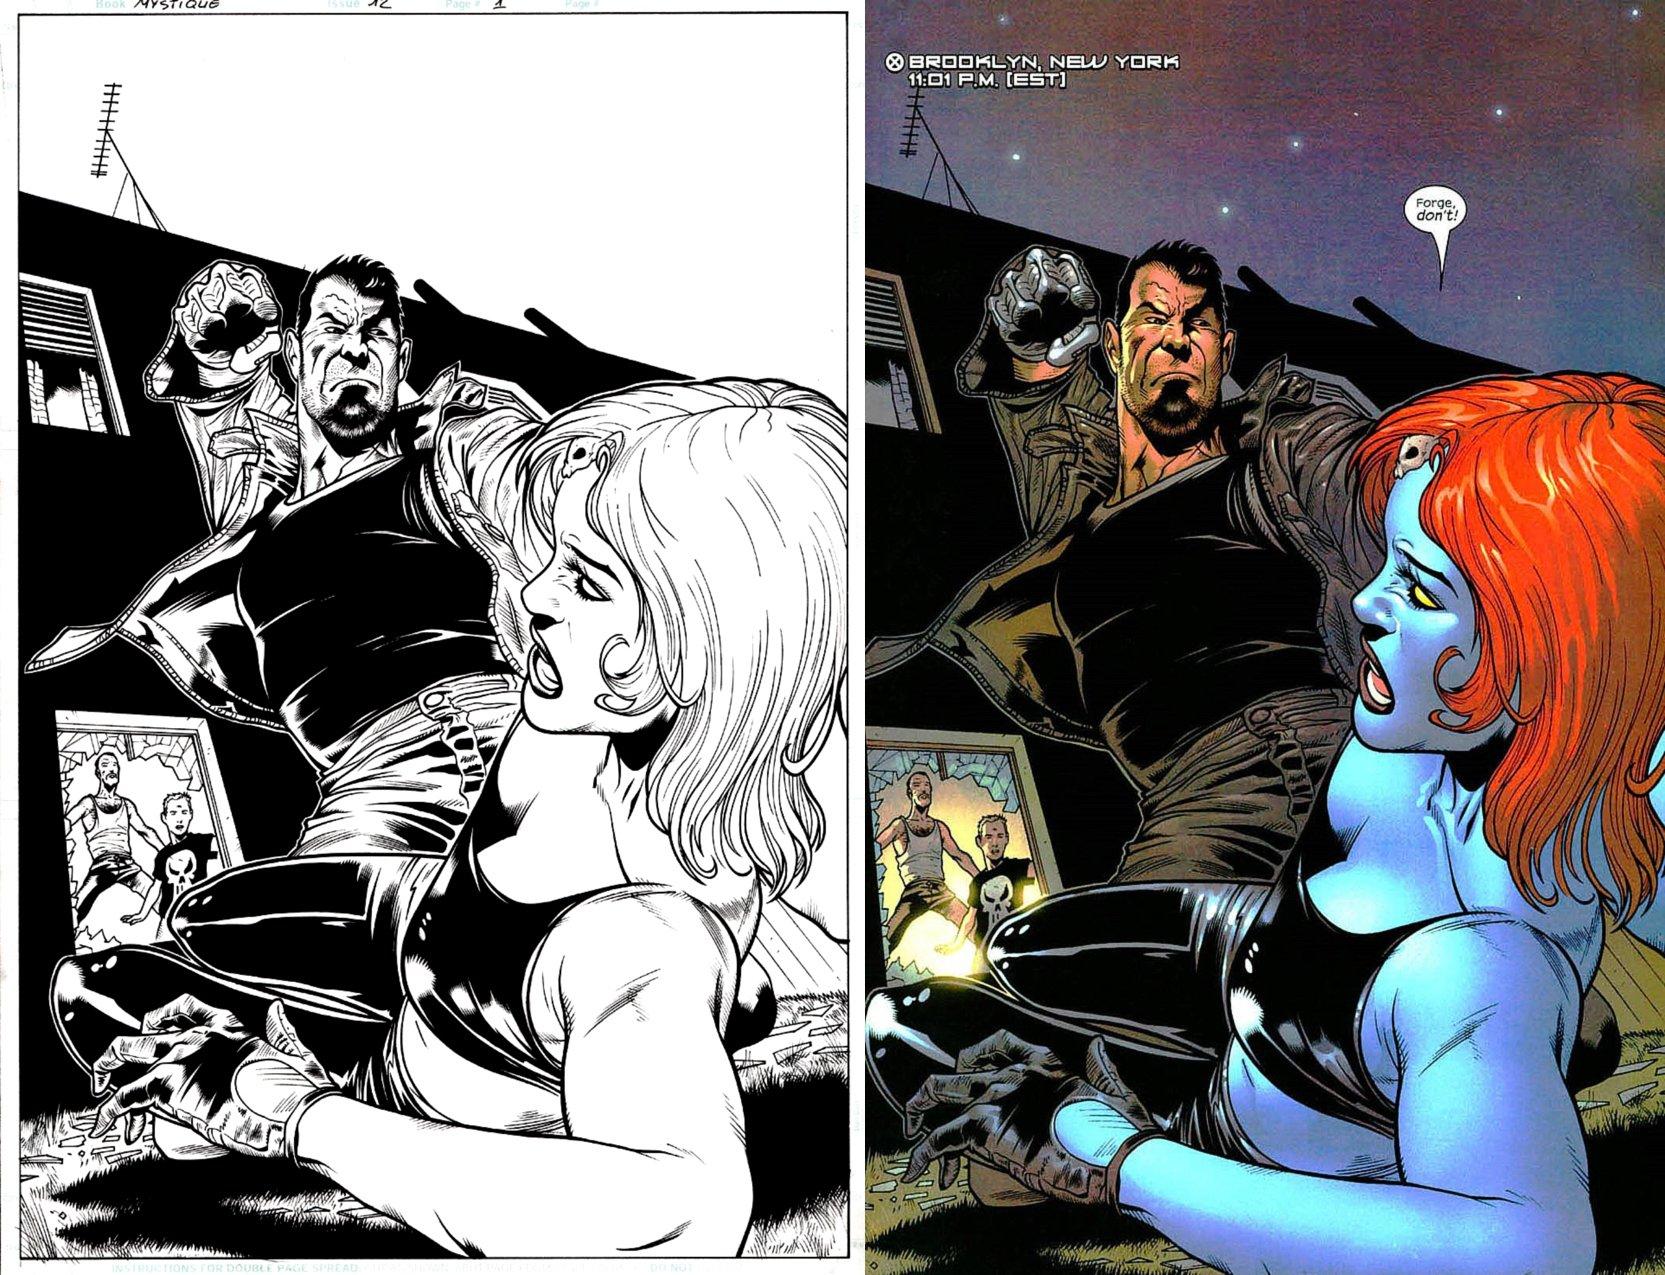 Mystique #12 p 1 SPLASH (Mystique Battles Forge!) 2004